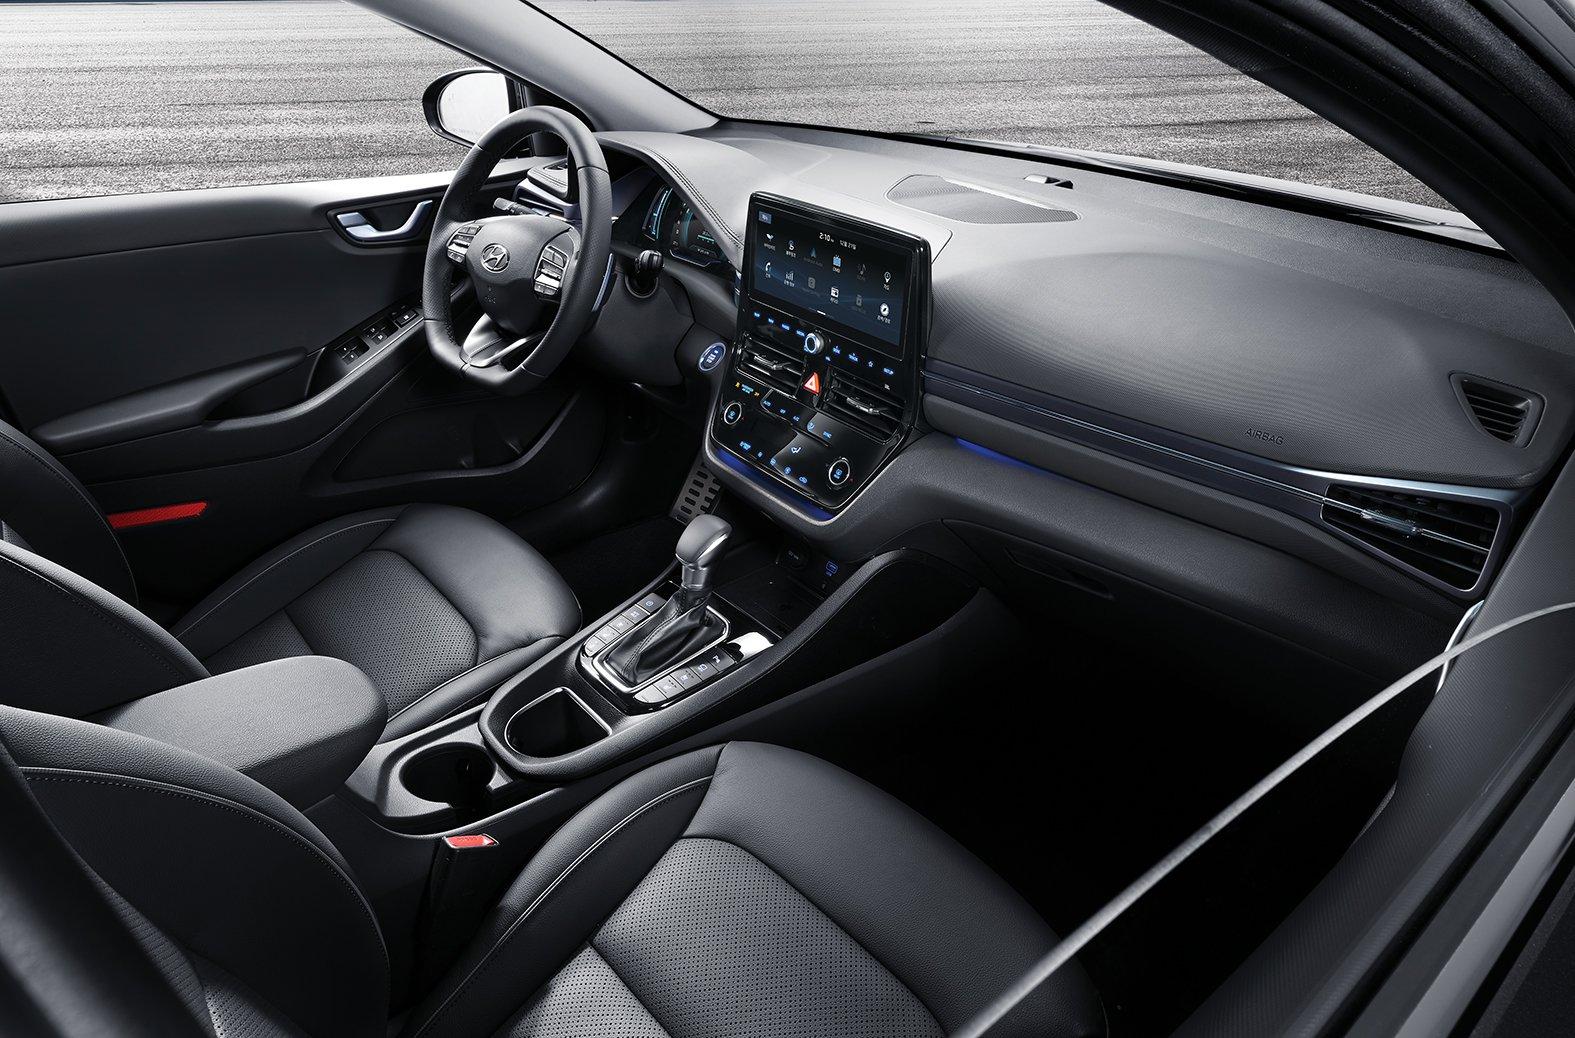 2020 Hyundai Ioniq Adds One Pedal Driving Capability